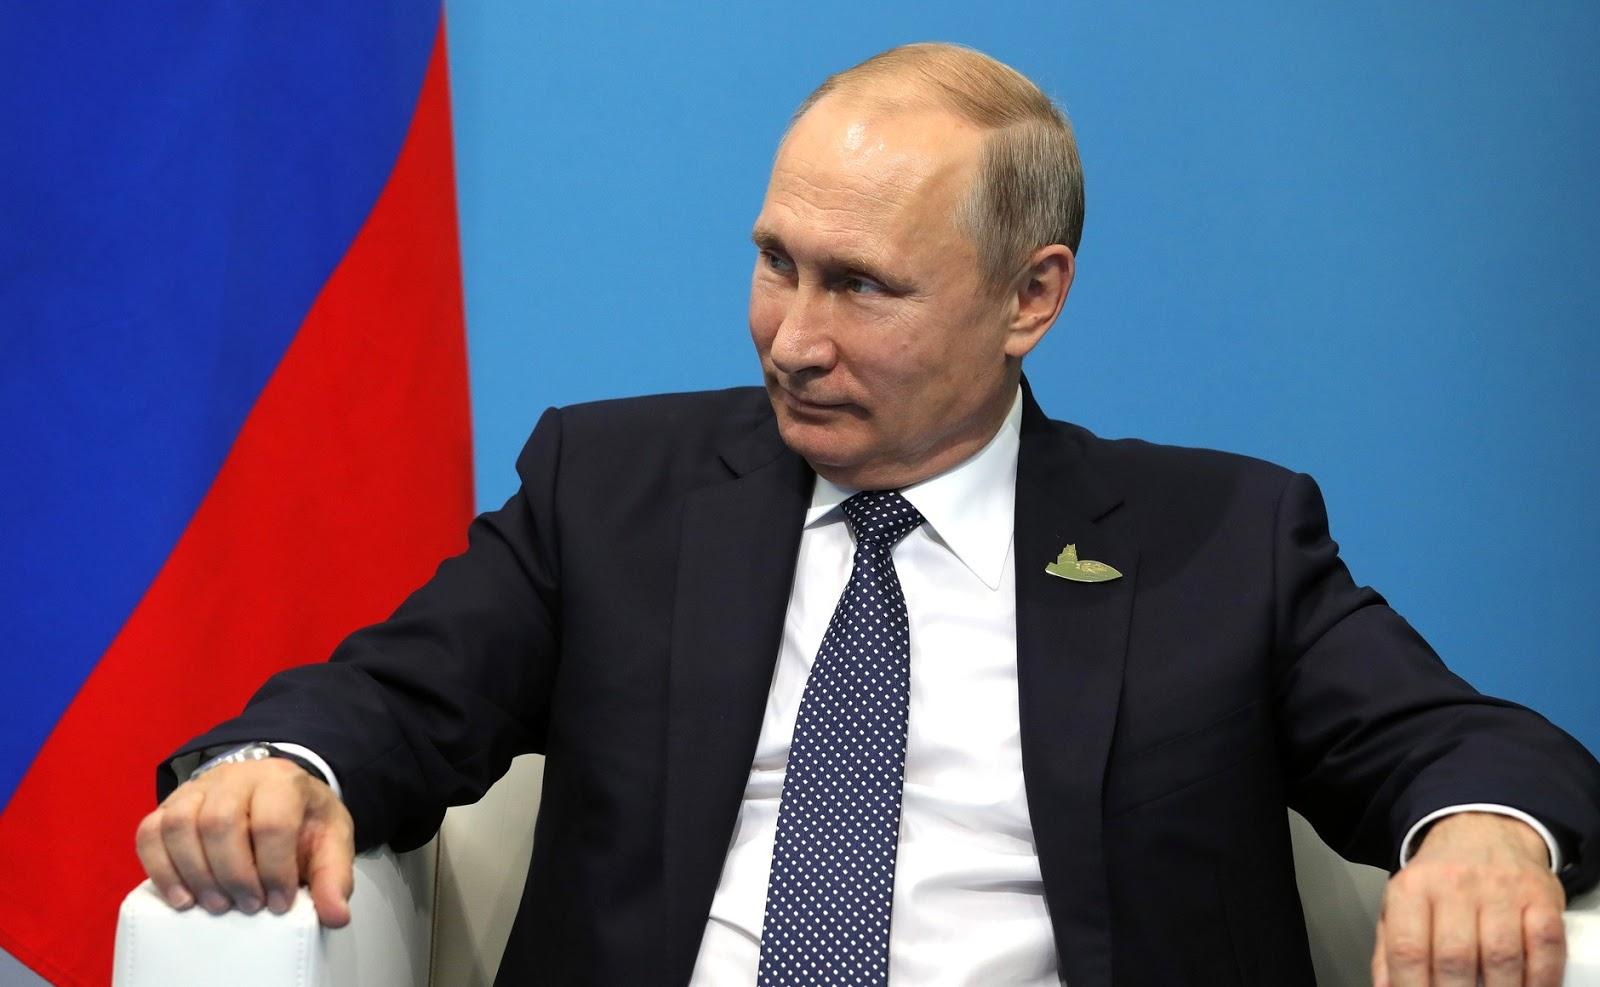 President elects new heads of Karelia, Sverdlovsk and Irkutsk regions 23.05.2012 76